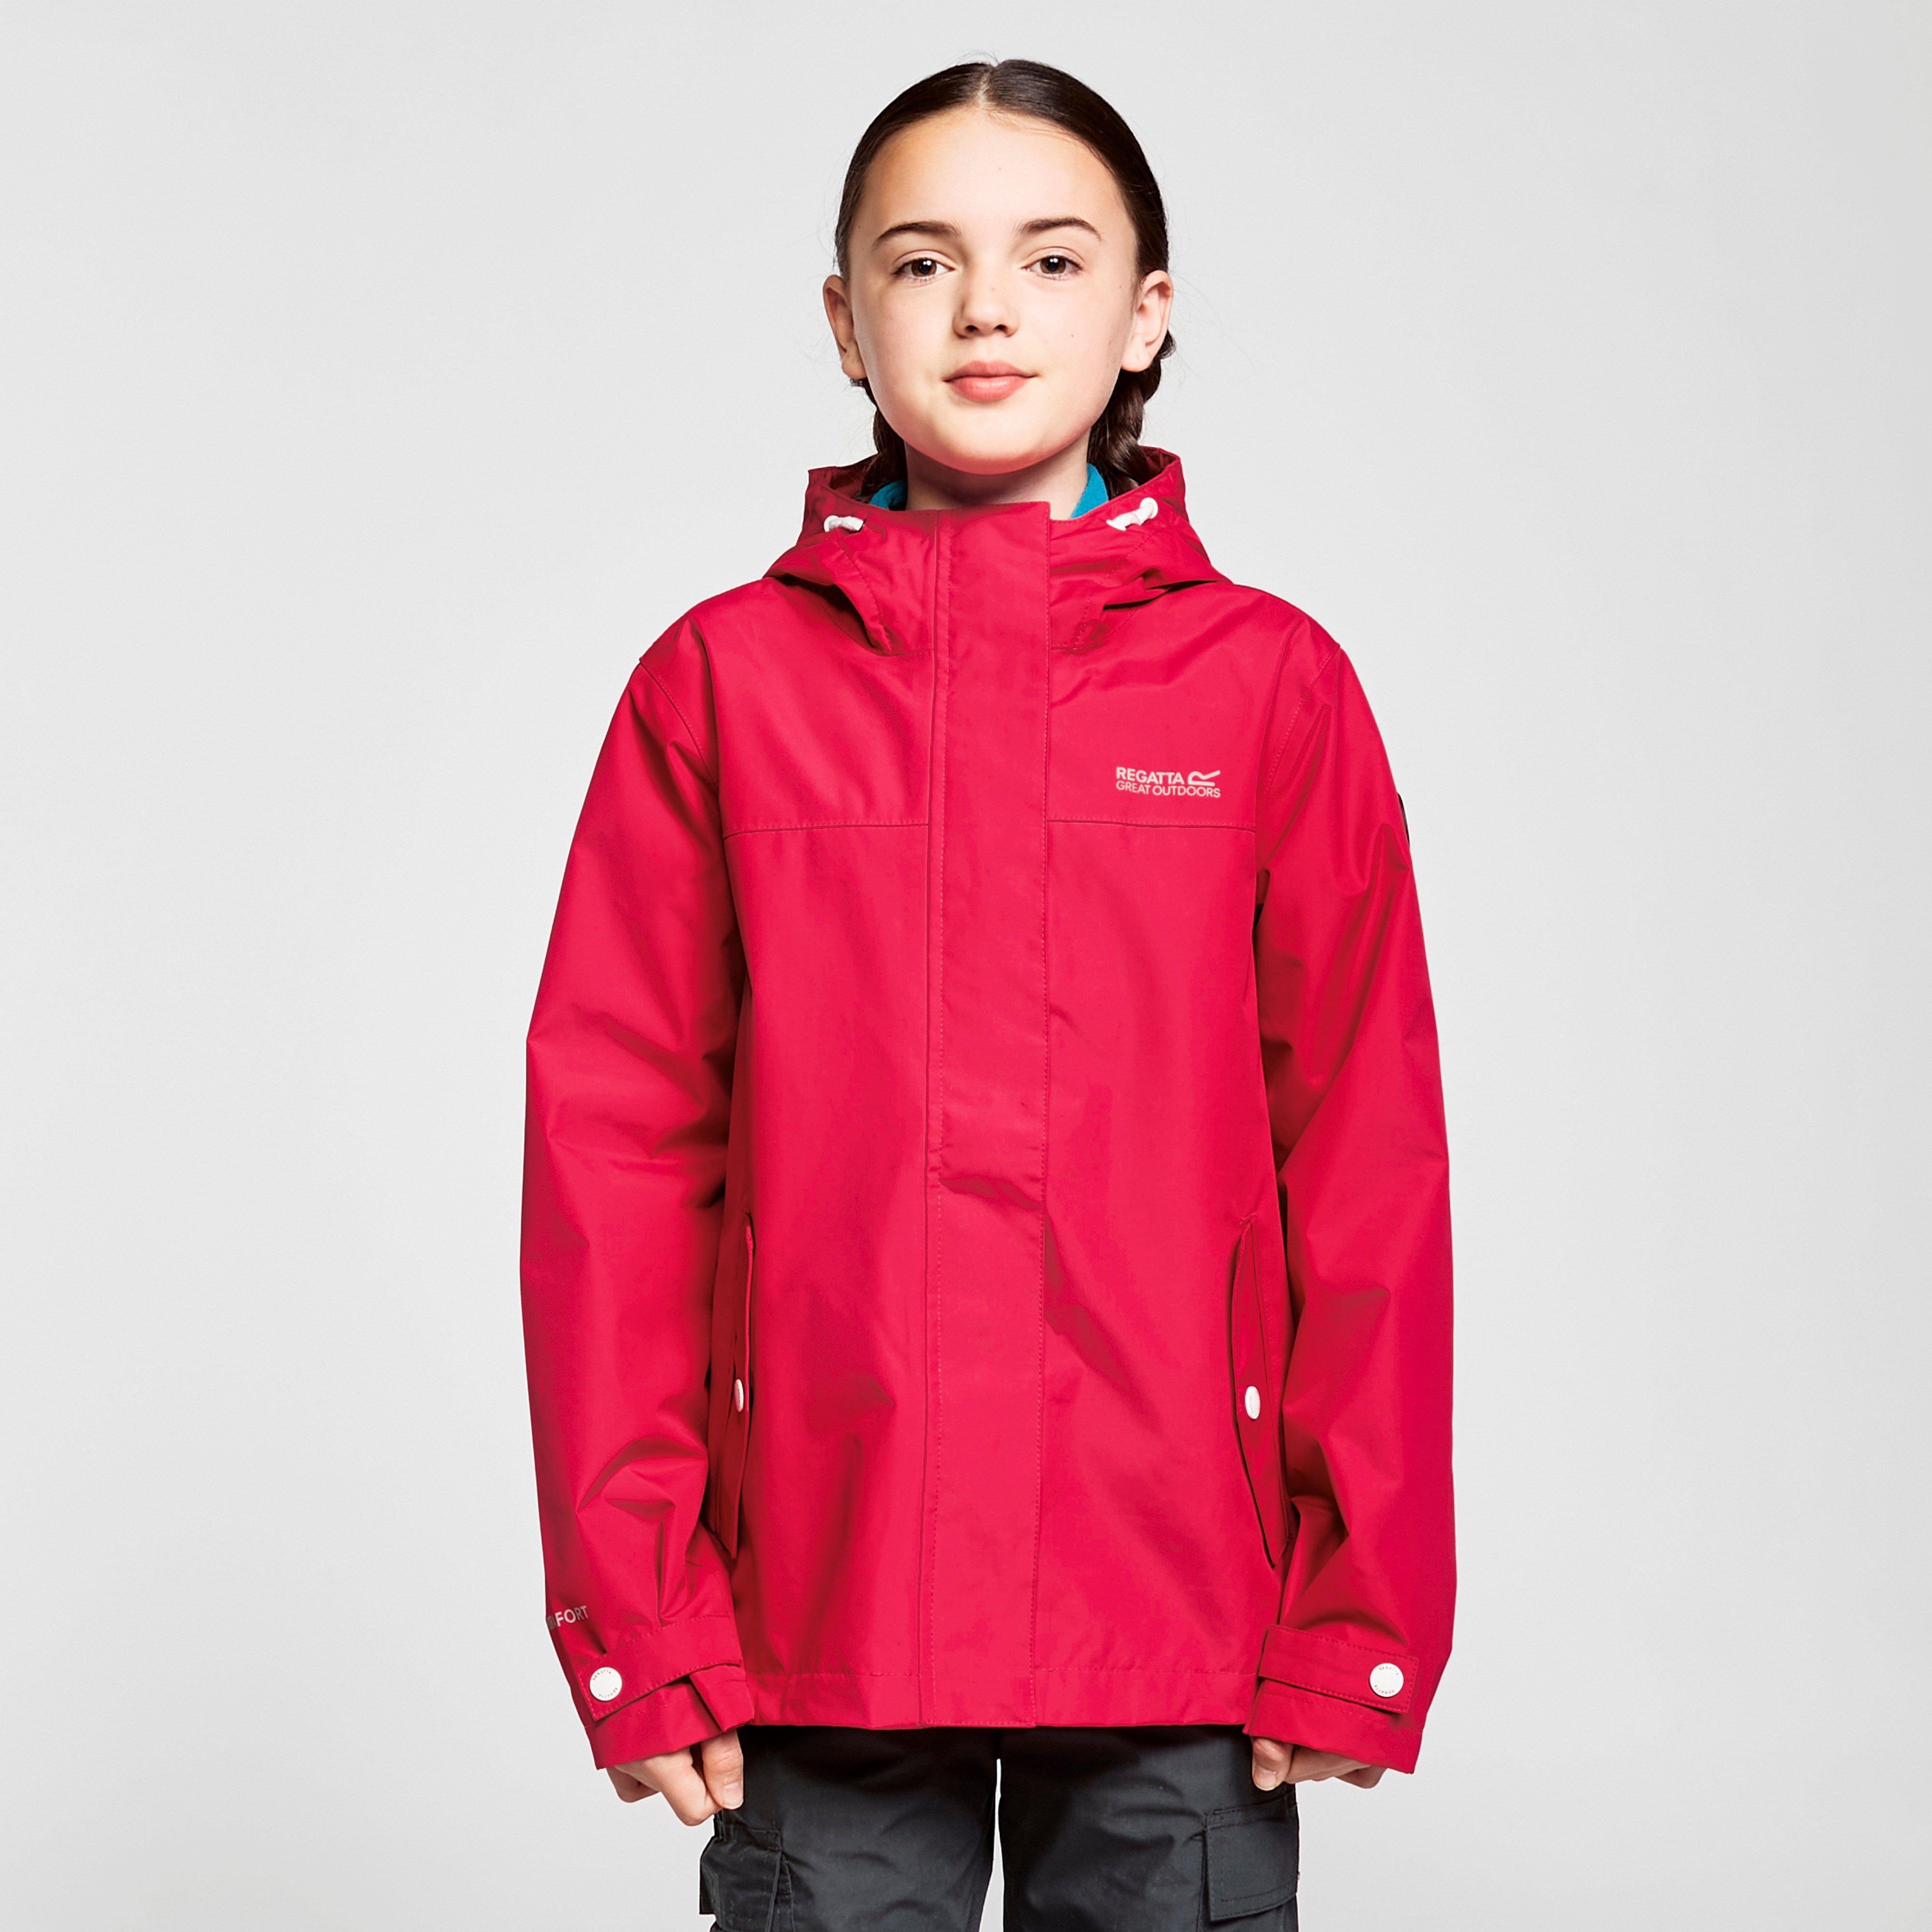 Regatta Kids' Bibiana Waterproof Jacket - Pnk/Pnk, Pink